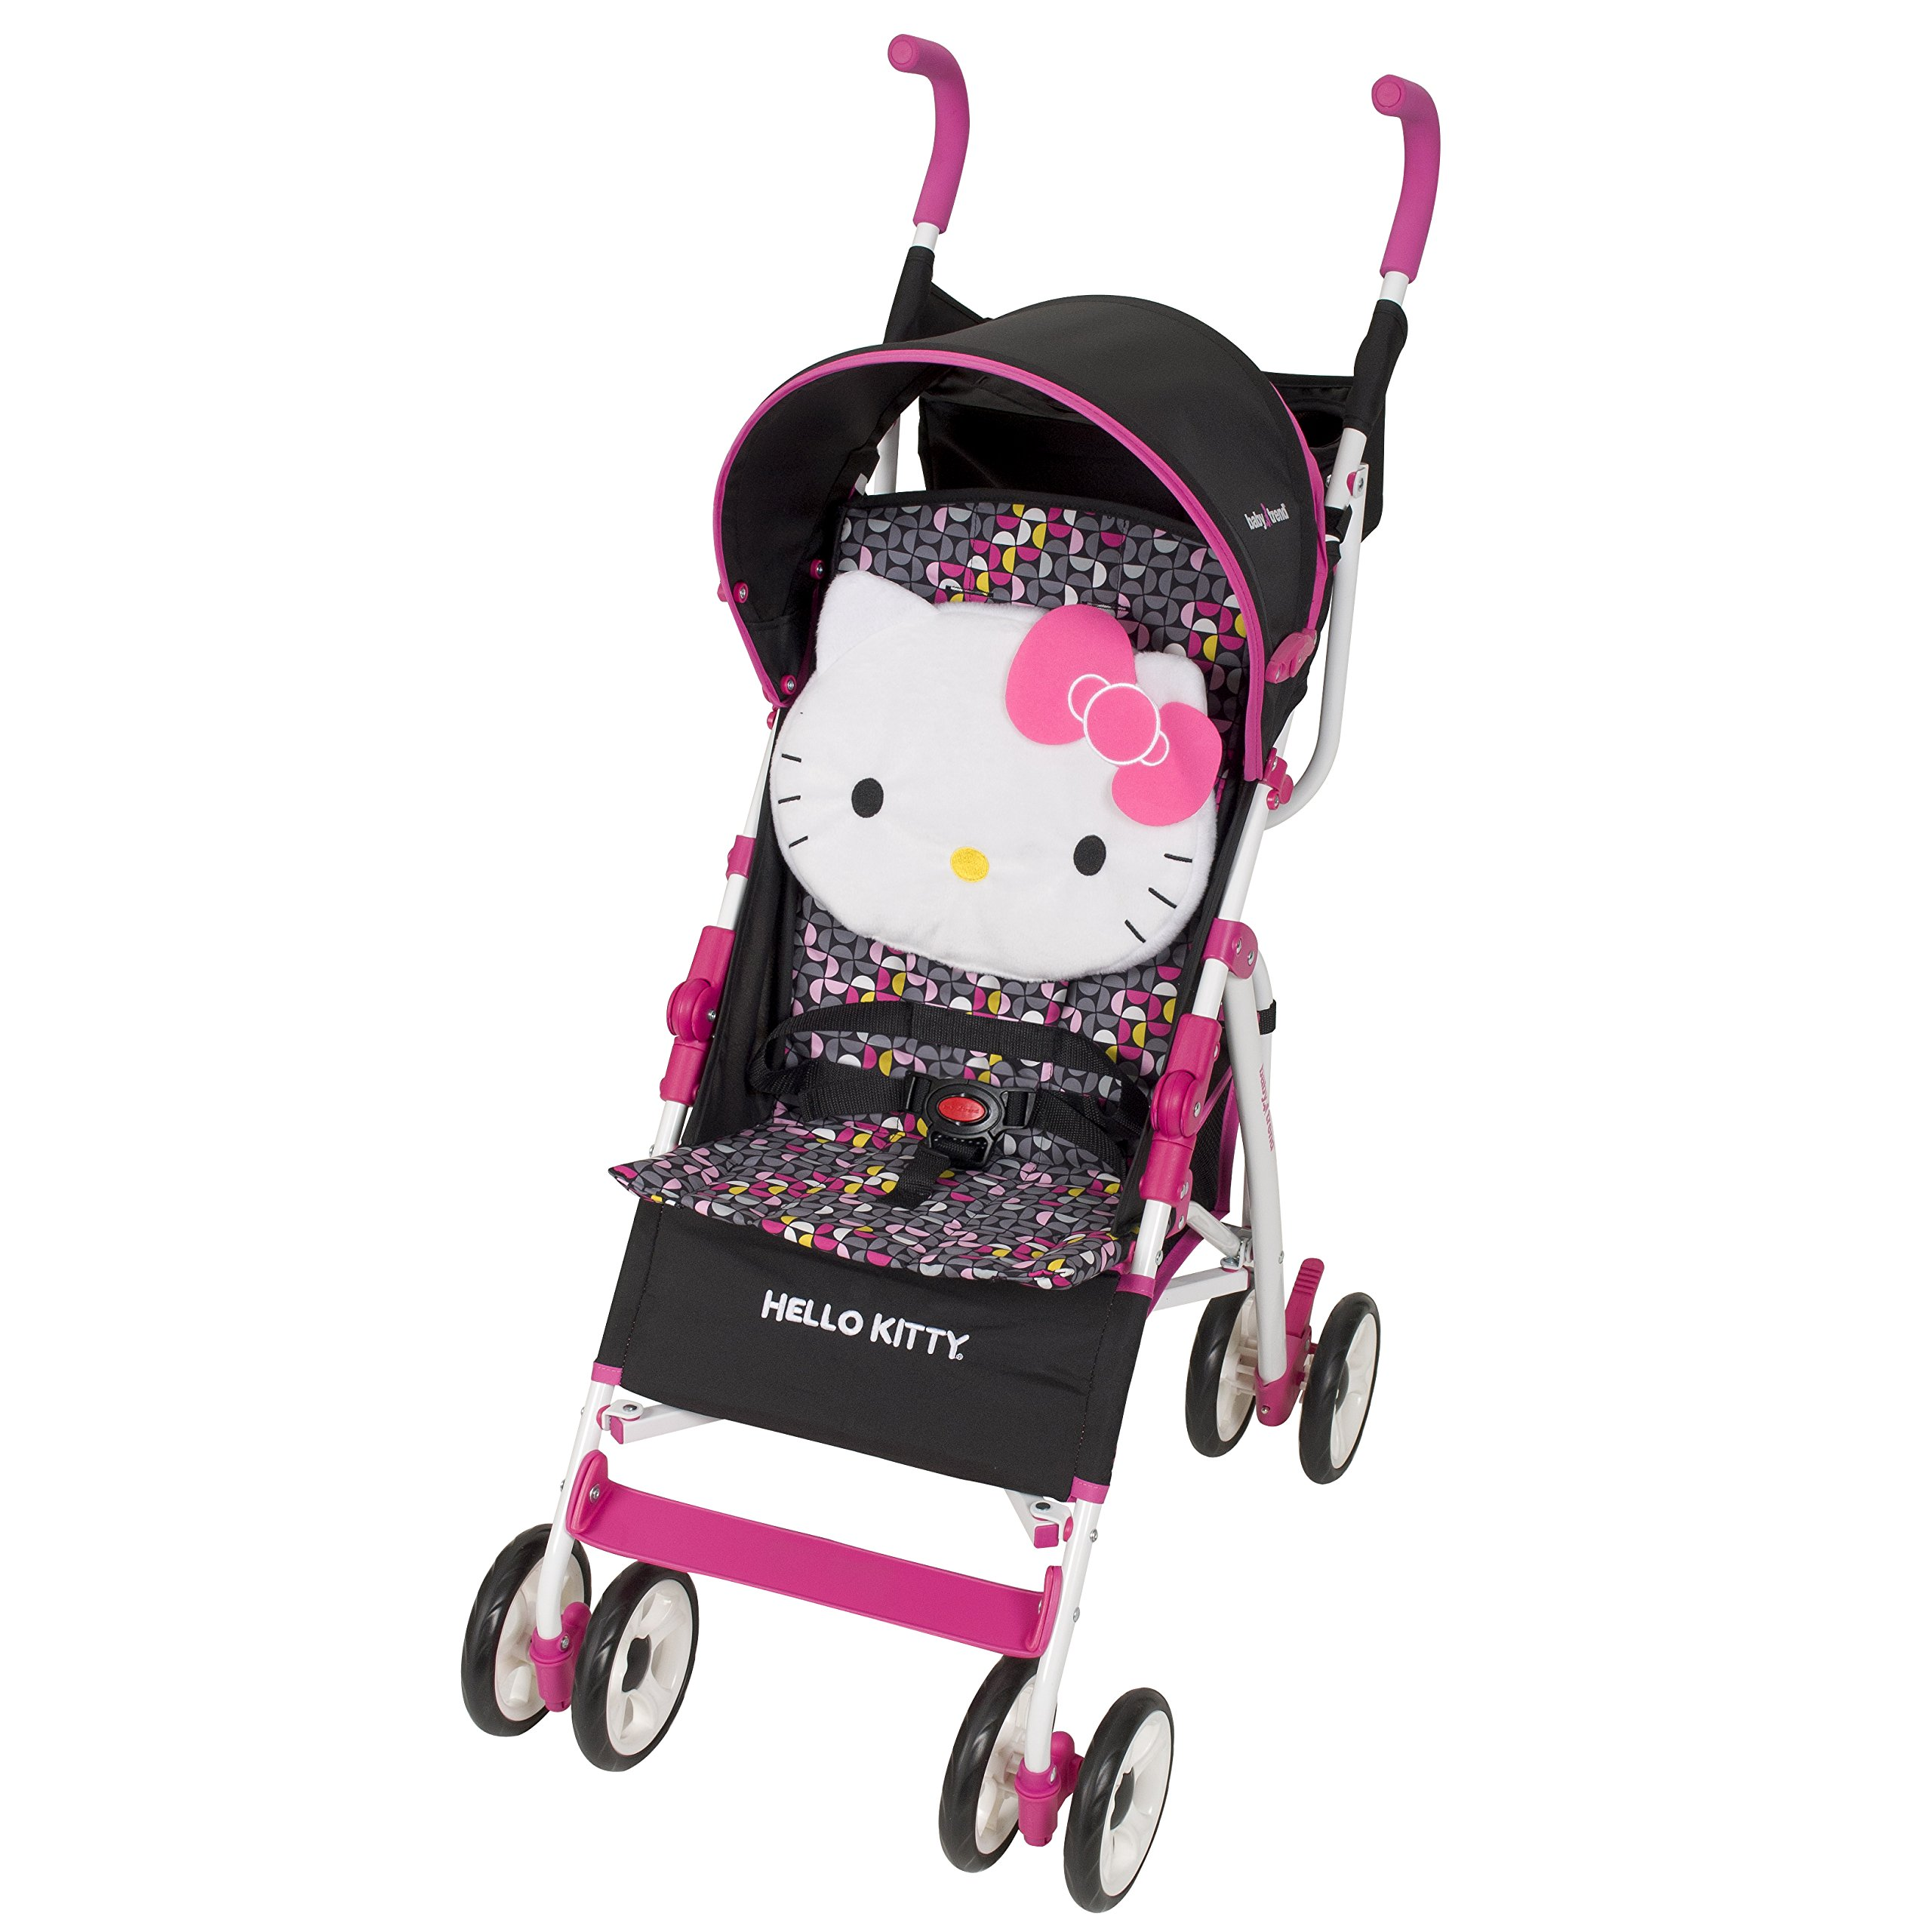 Baby Trend Hello Kitty Kruiser Stroller, Pinwheel